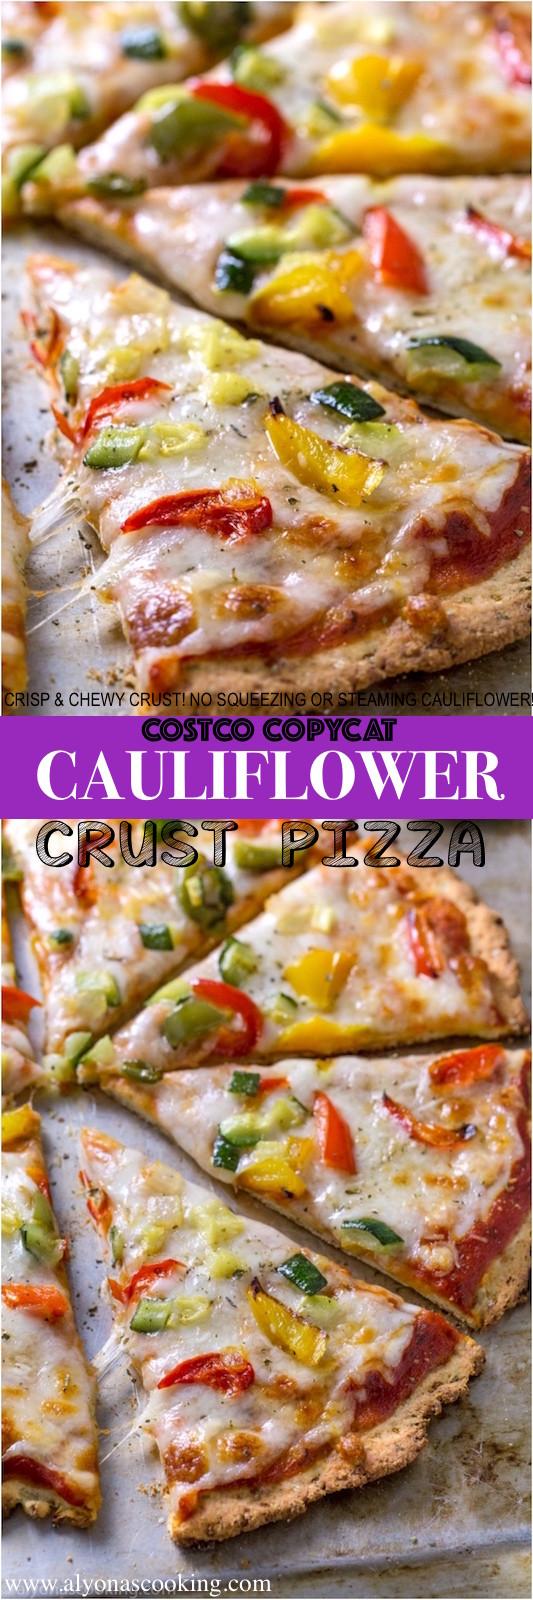 Costco Cauliflower Pizza  Costco Copycat Cauliflower Pizza Crust